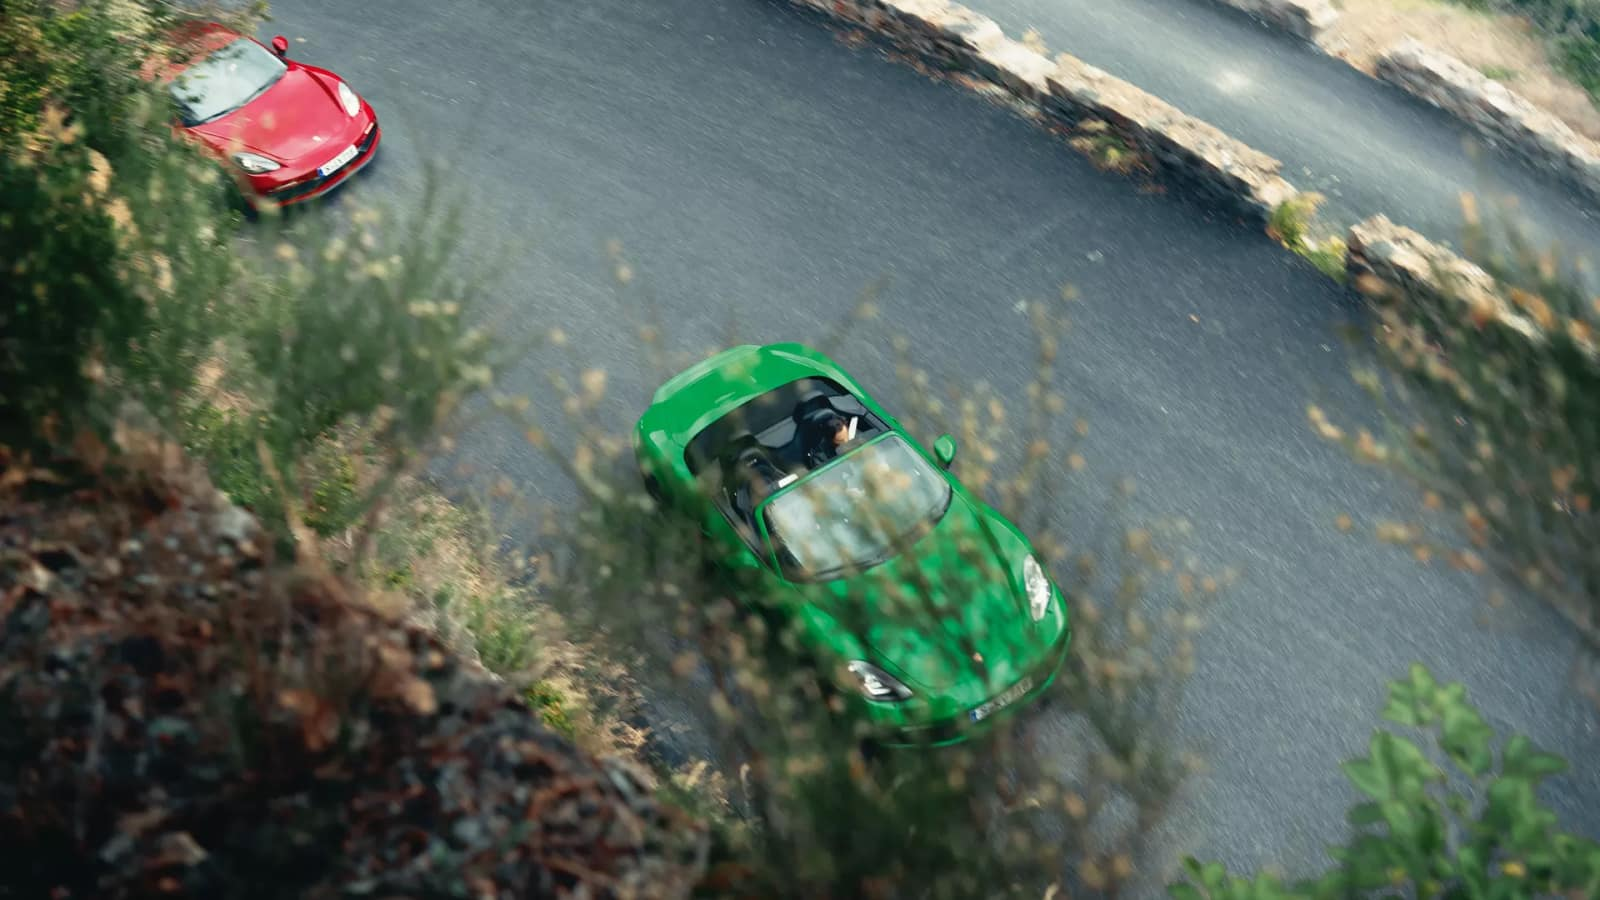 2020 Porsche 718 Boxster GTS 4.0 For Sale In Los Angeles, CA